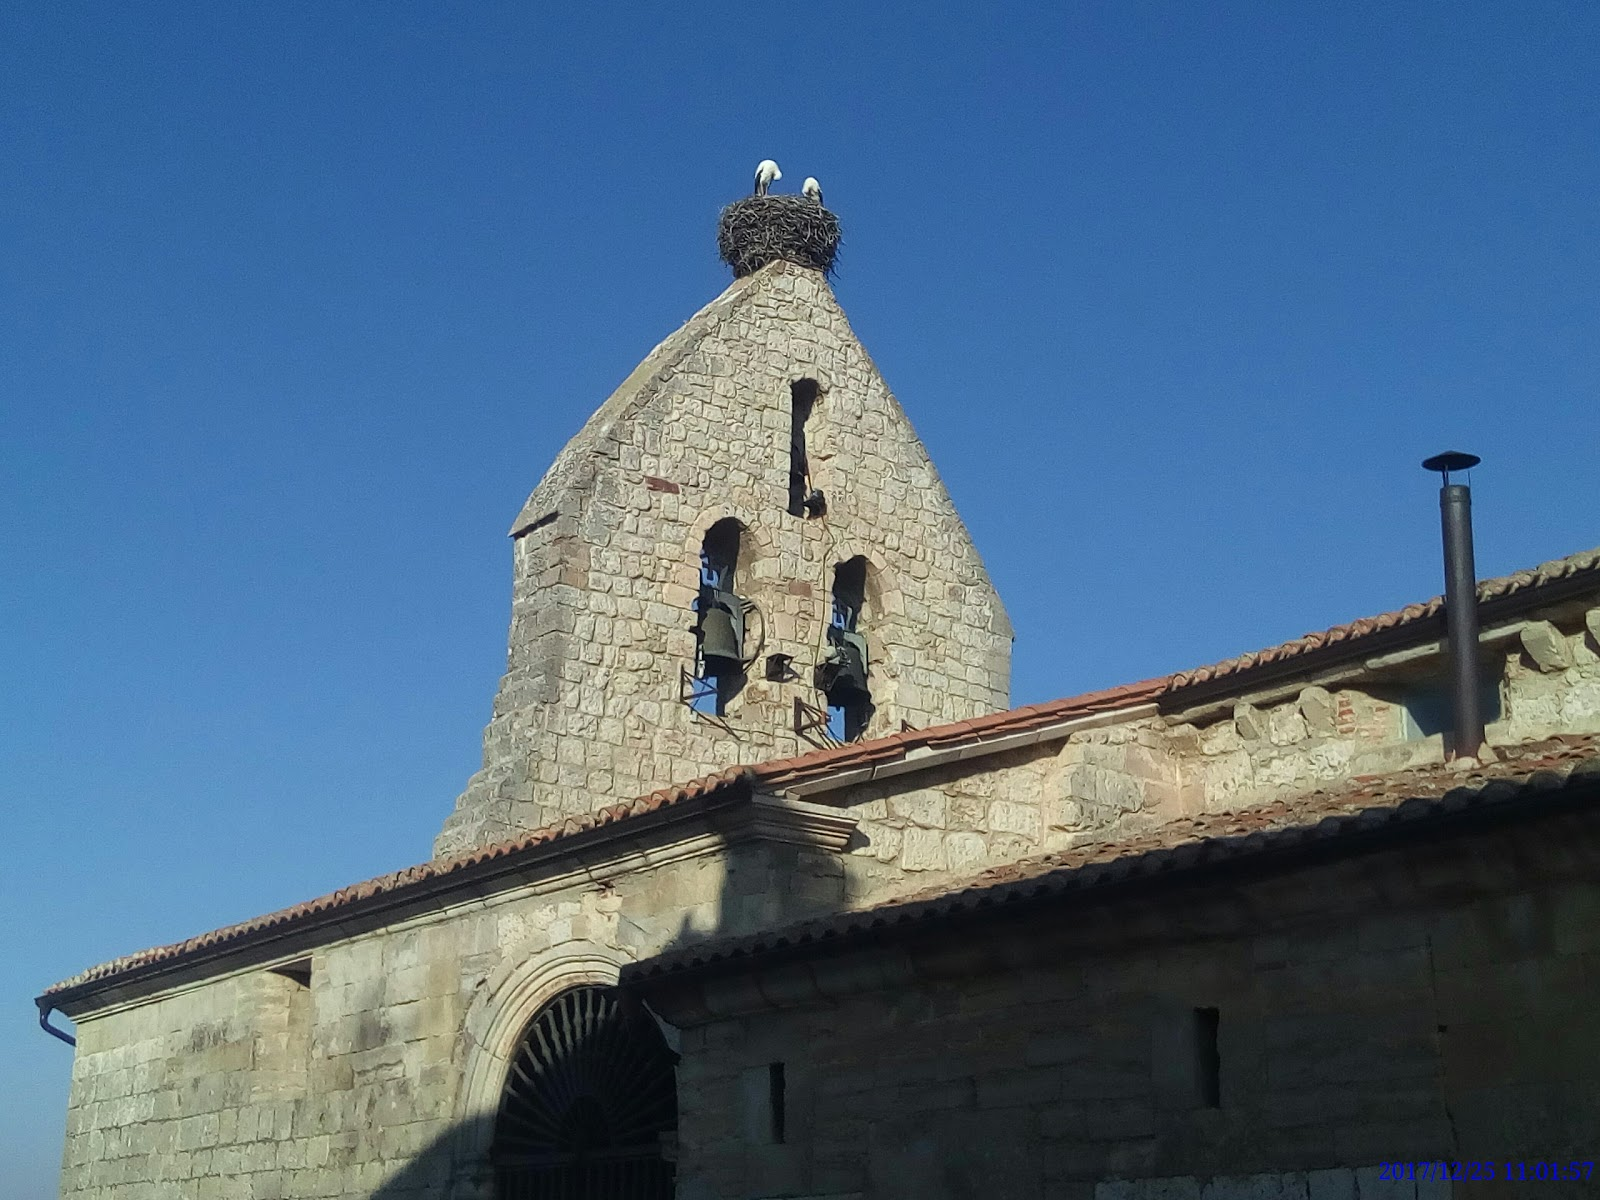 Villalbilla de Burgos